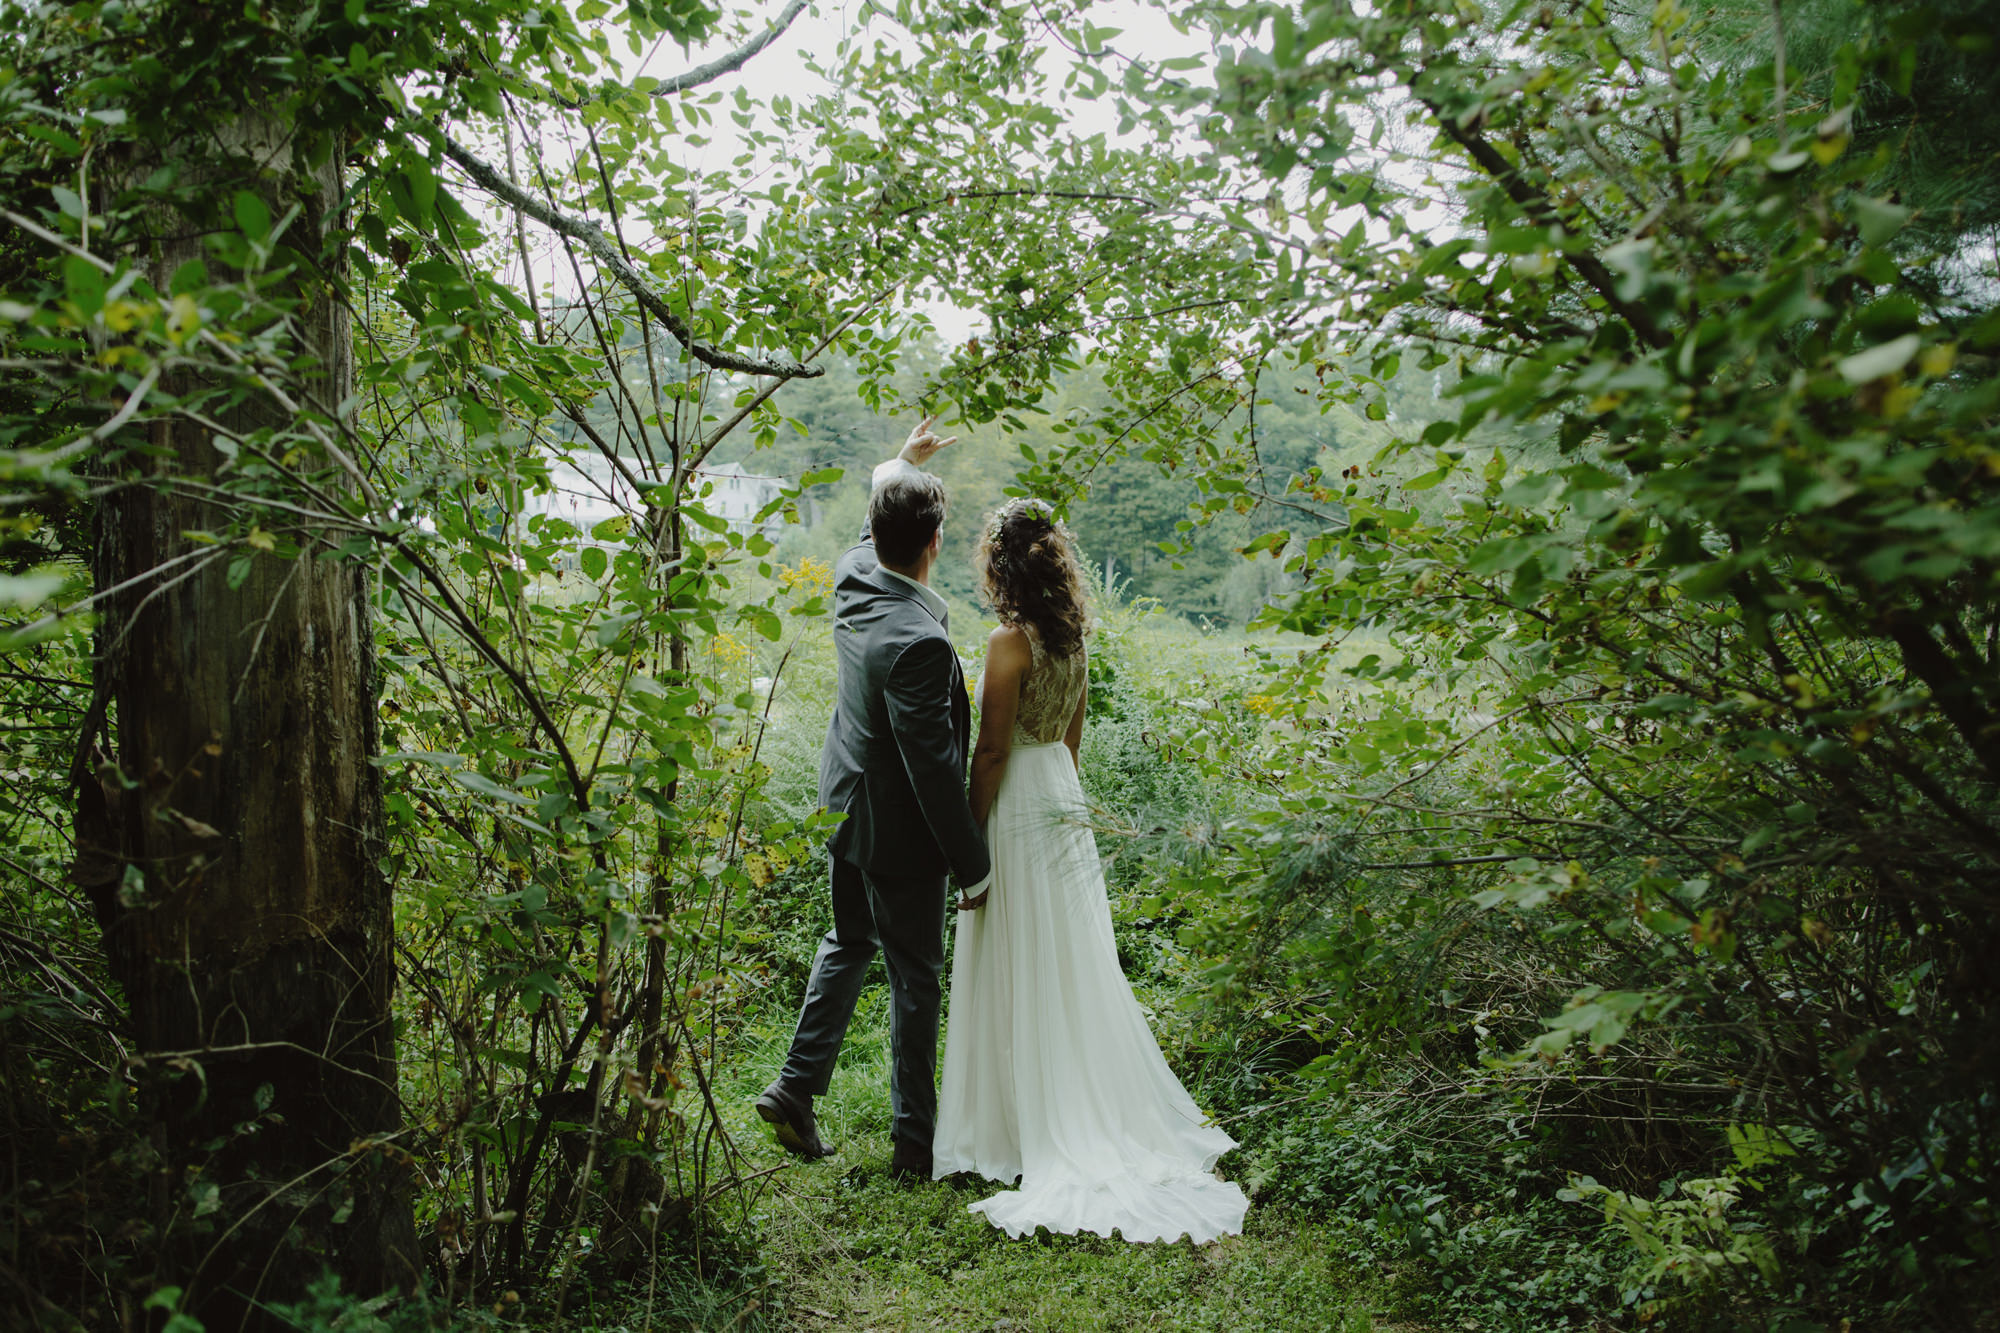 catskills_big_indian_springs_upstate_NY_wedding_sammblake084.jpg